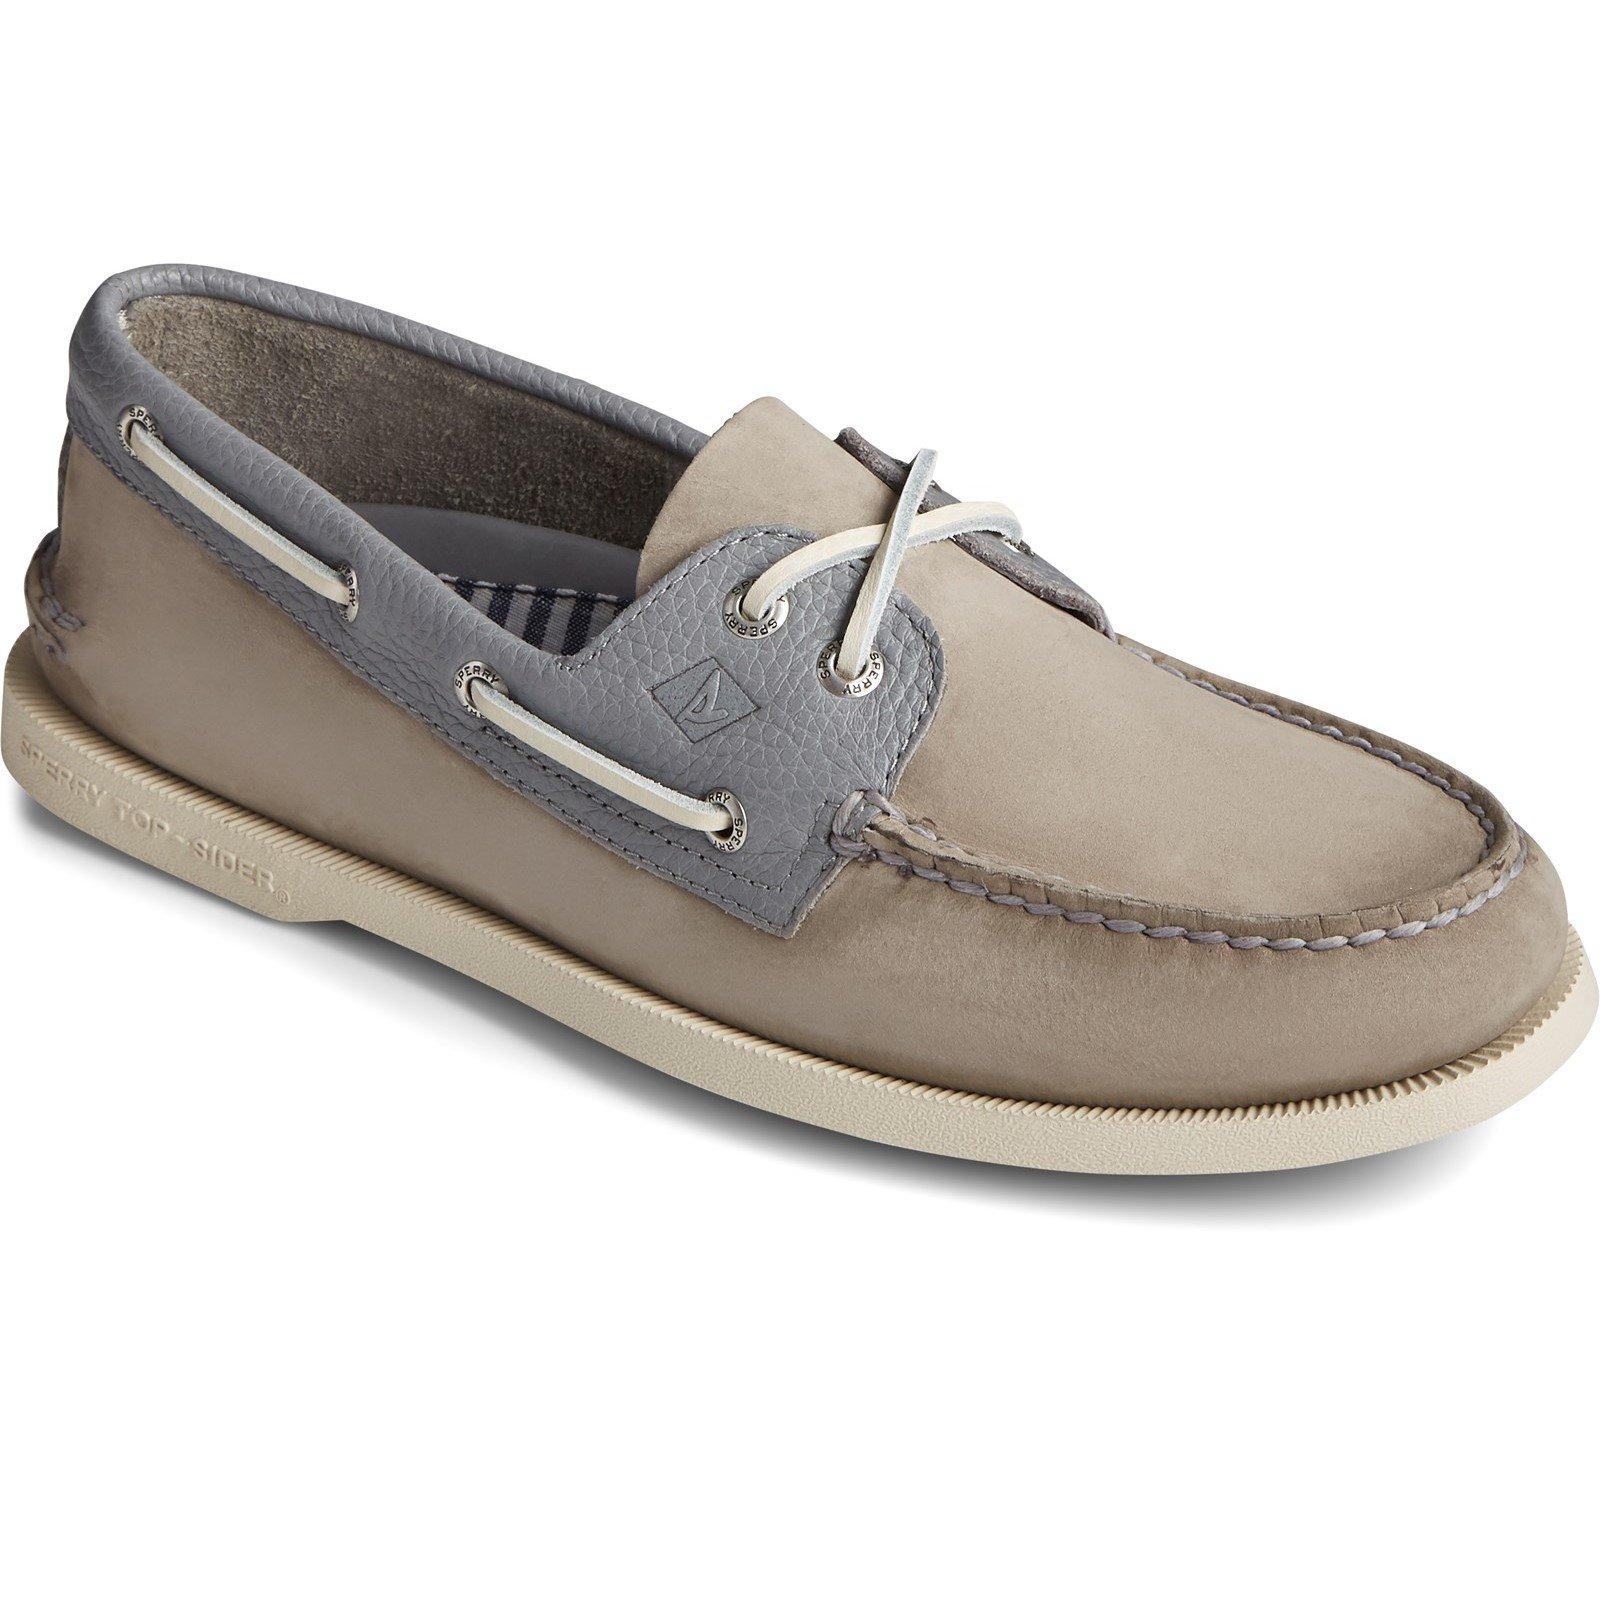 Sperry Men's A/O 2-Eye Nubuck Boat Shoe Various Colours 32920 - Grey 12